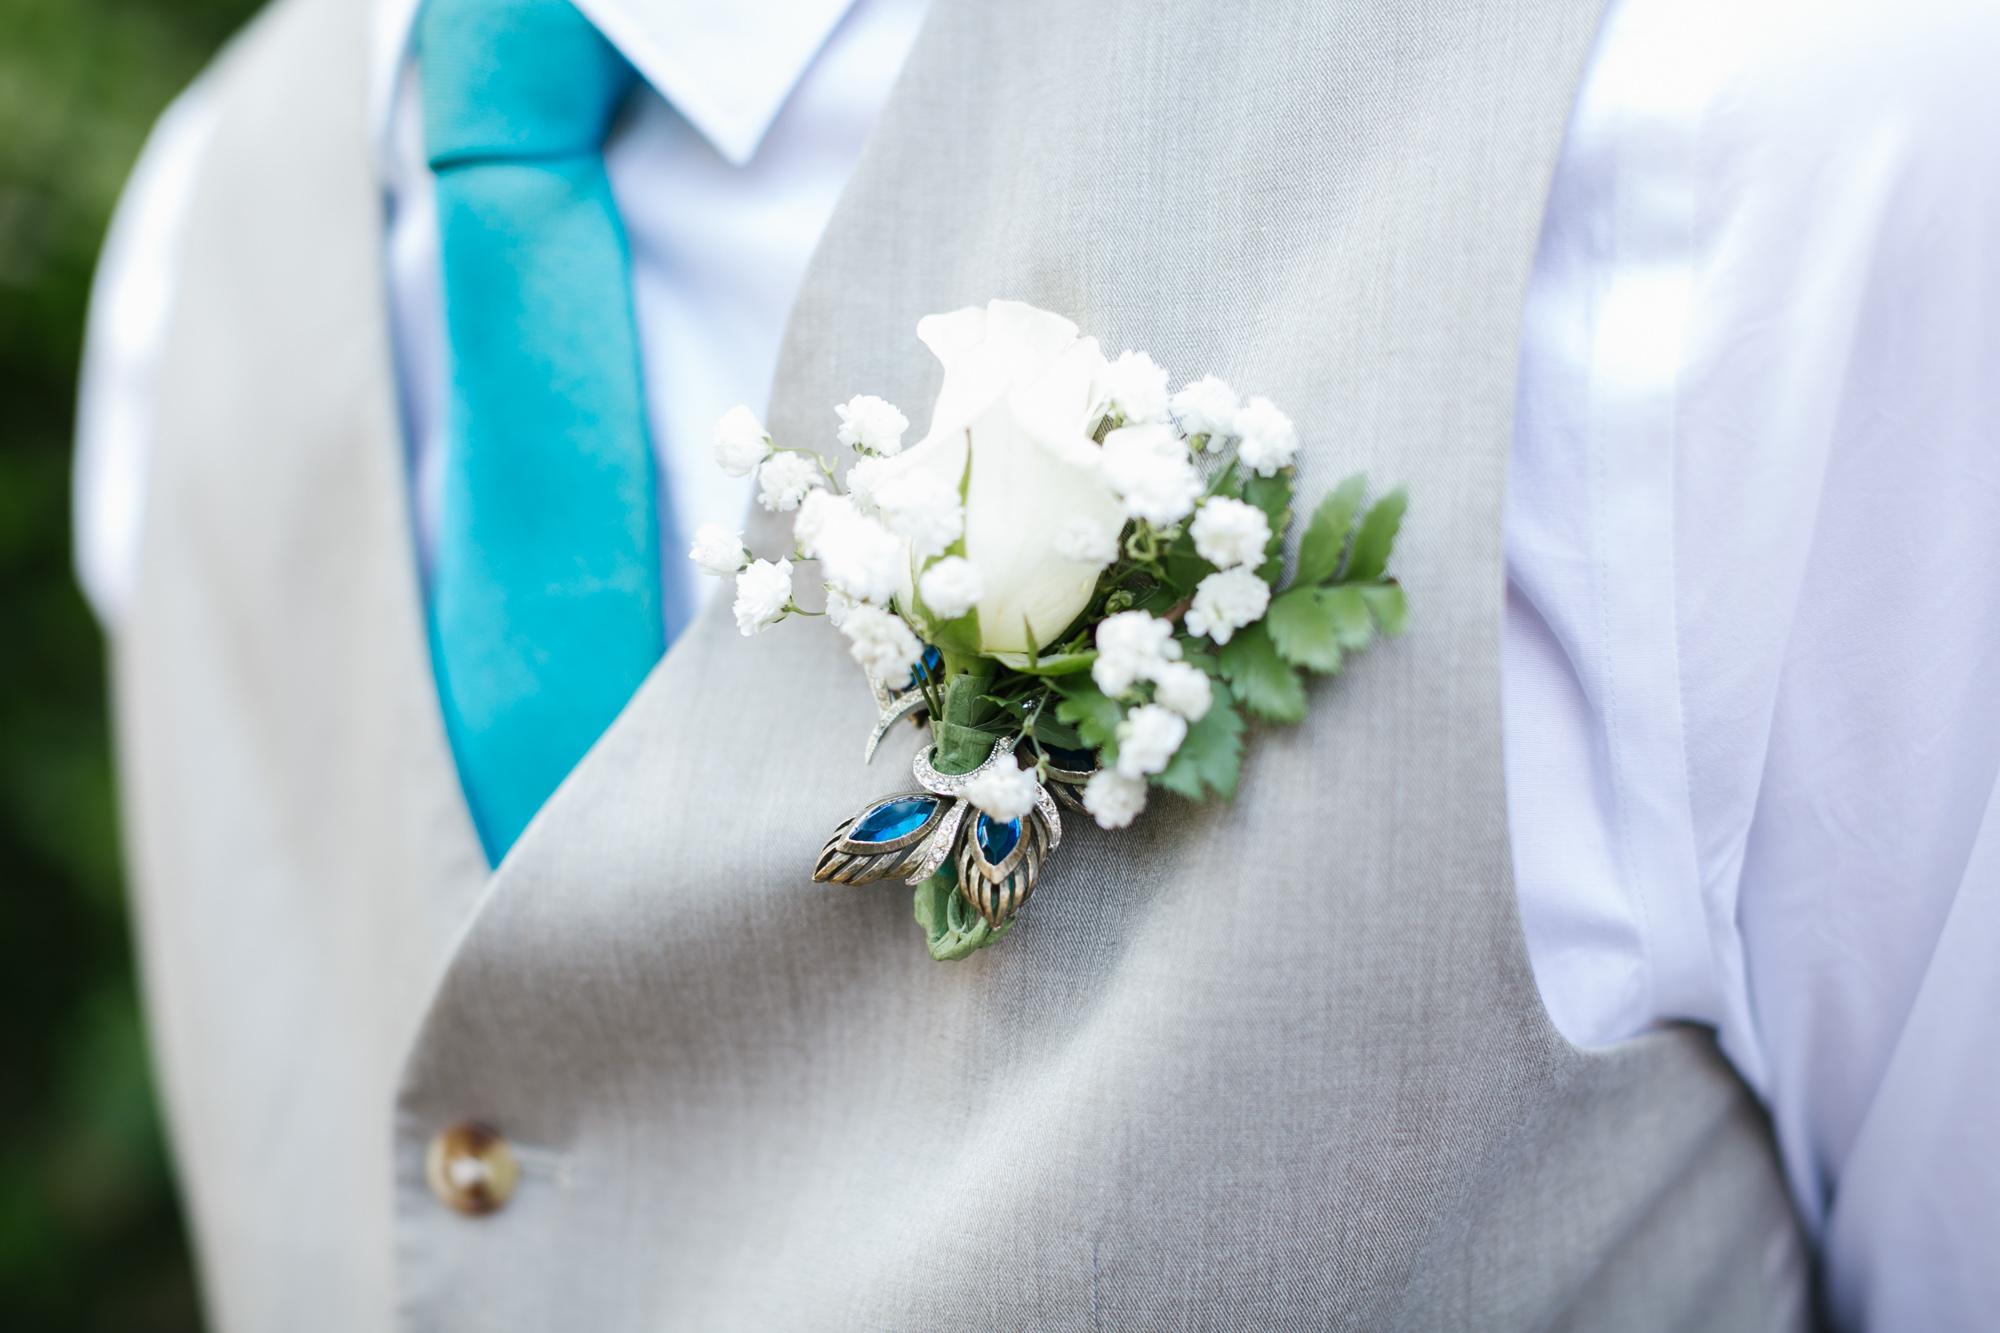 03_Cambria_wedding_samesex_coastal_intimate_Central_Coast_beach.jpg